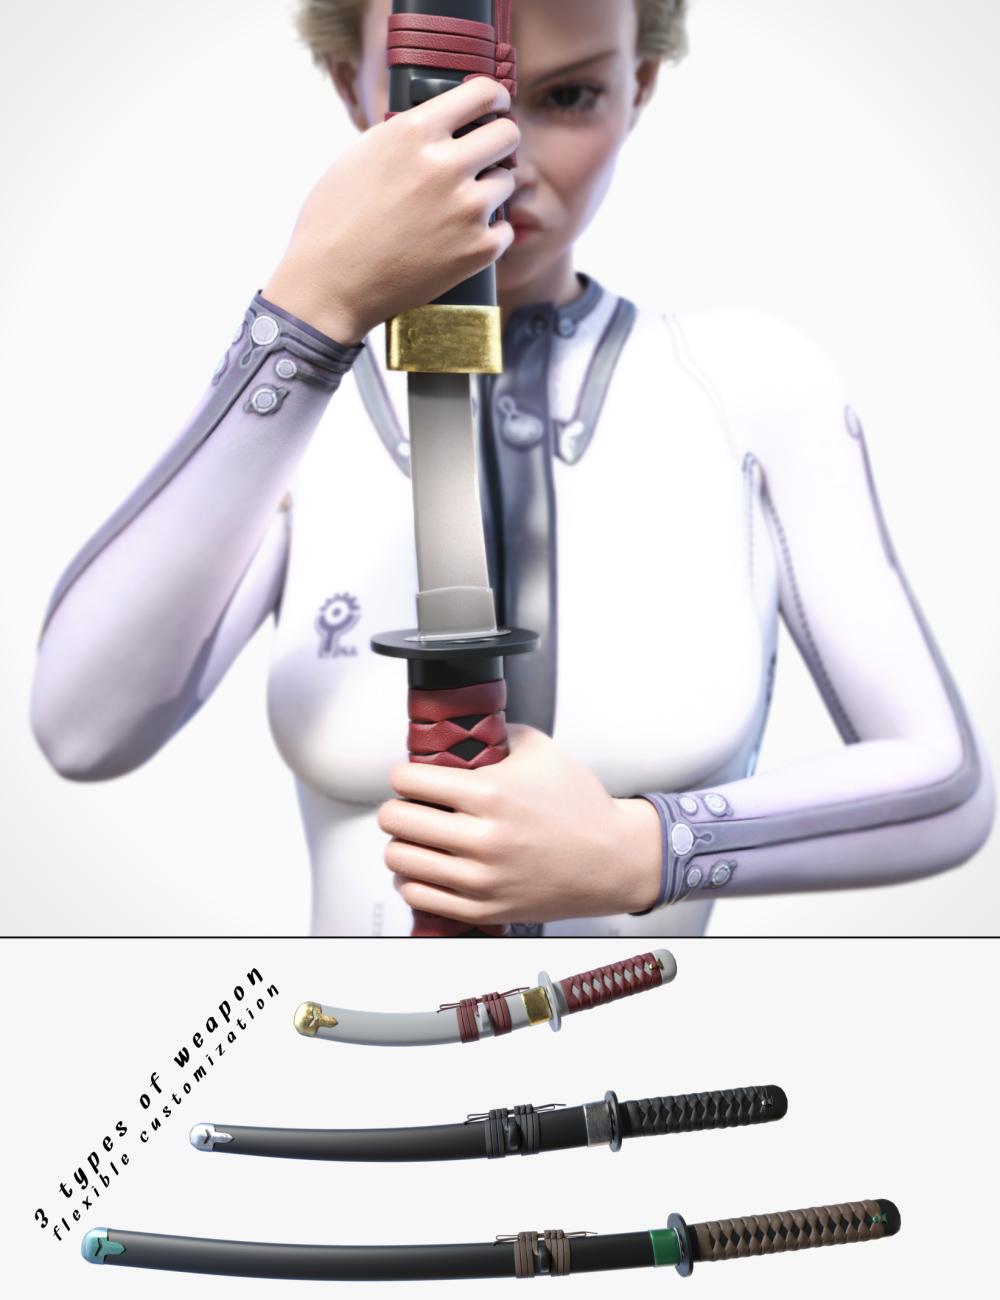 Far East Weapons by: Neikdian, 3D Models by Daz 3D